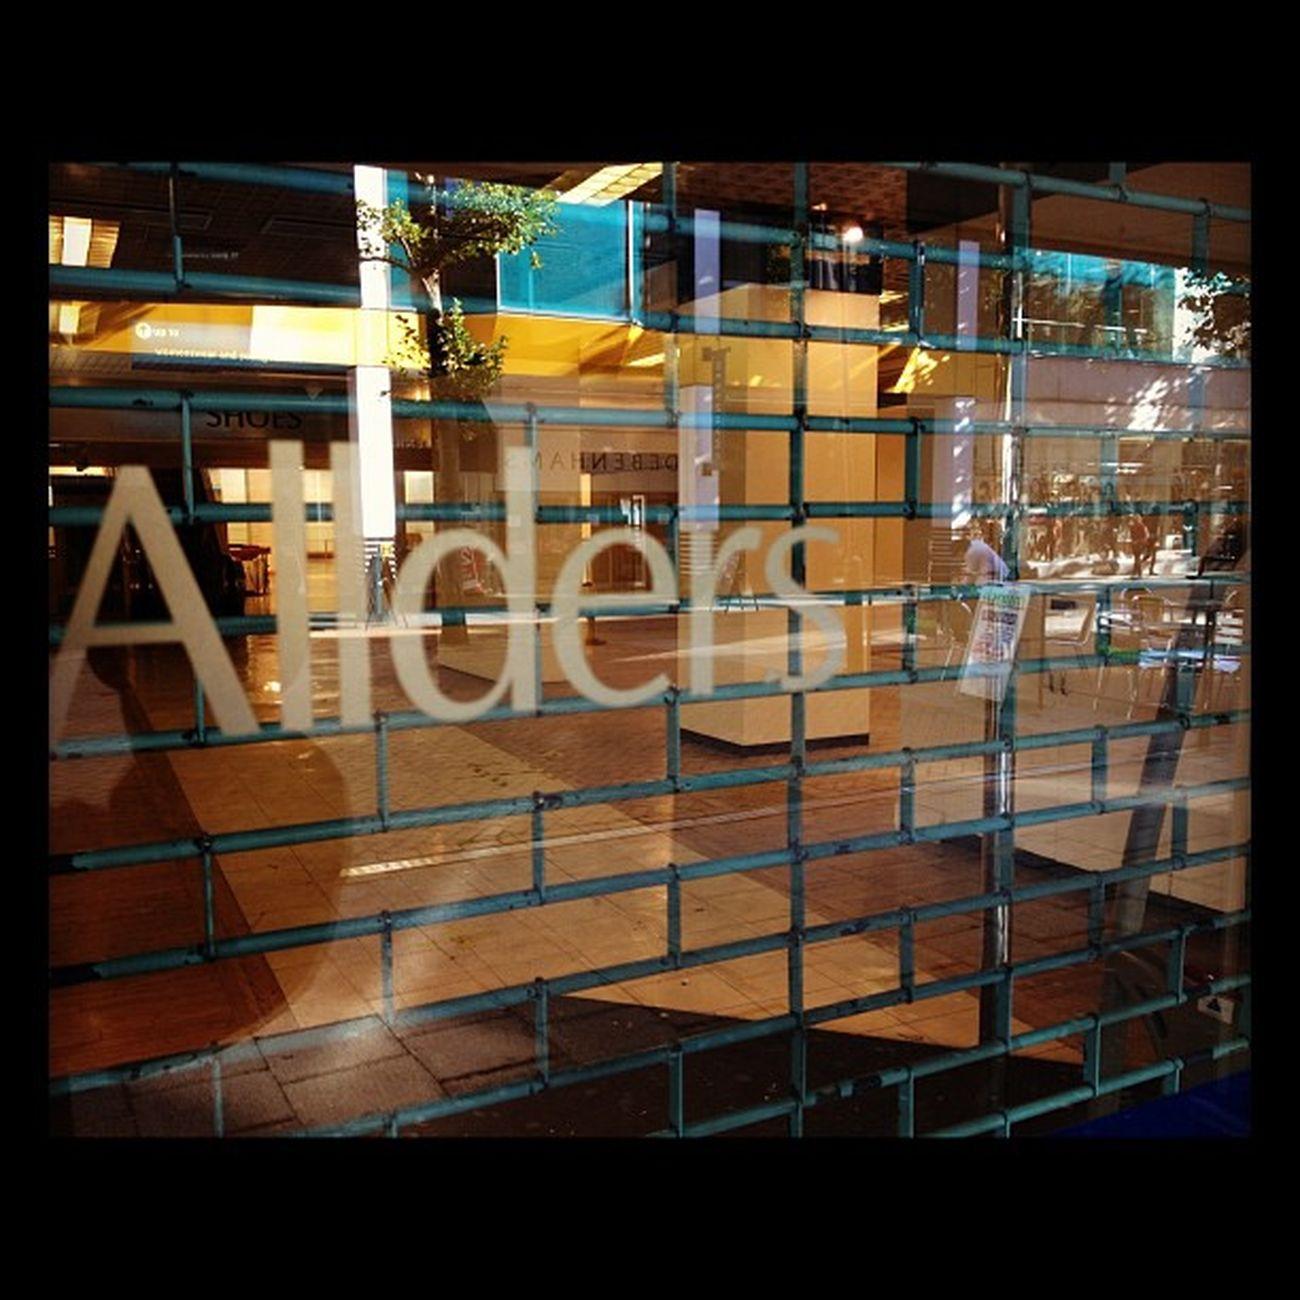 Visions of Croydon Allders Allders Closure Croydon Shopping shop northend